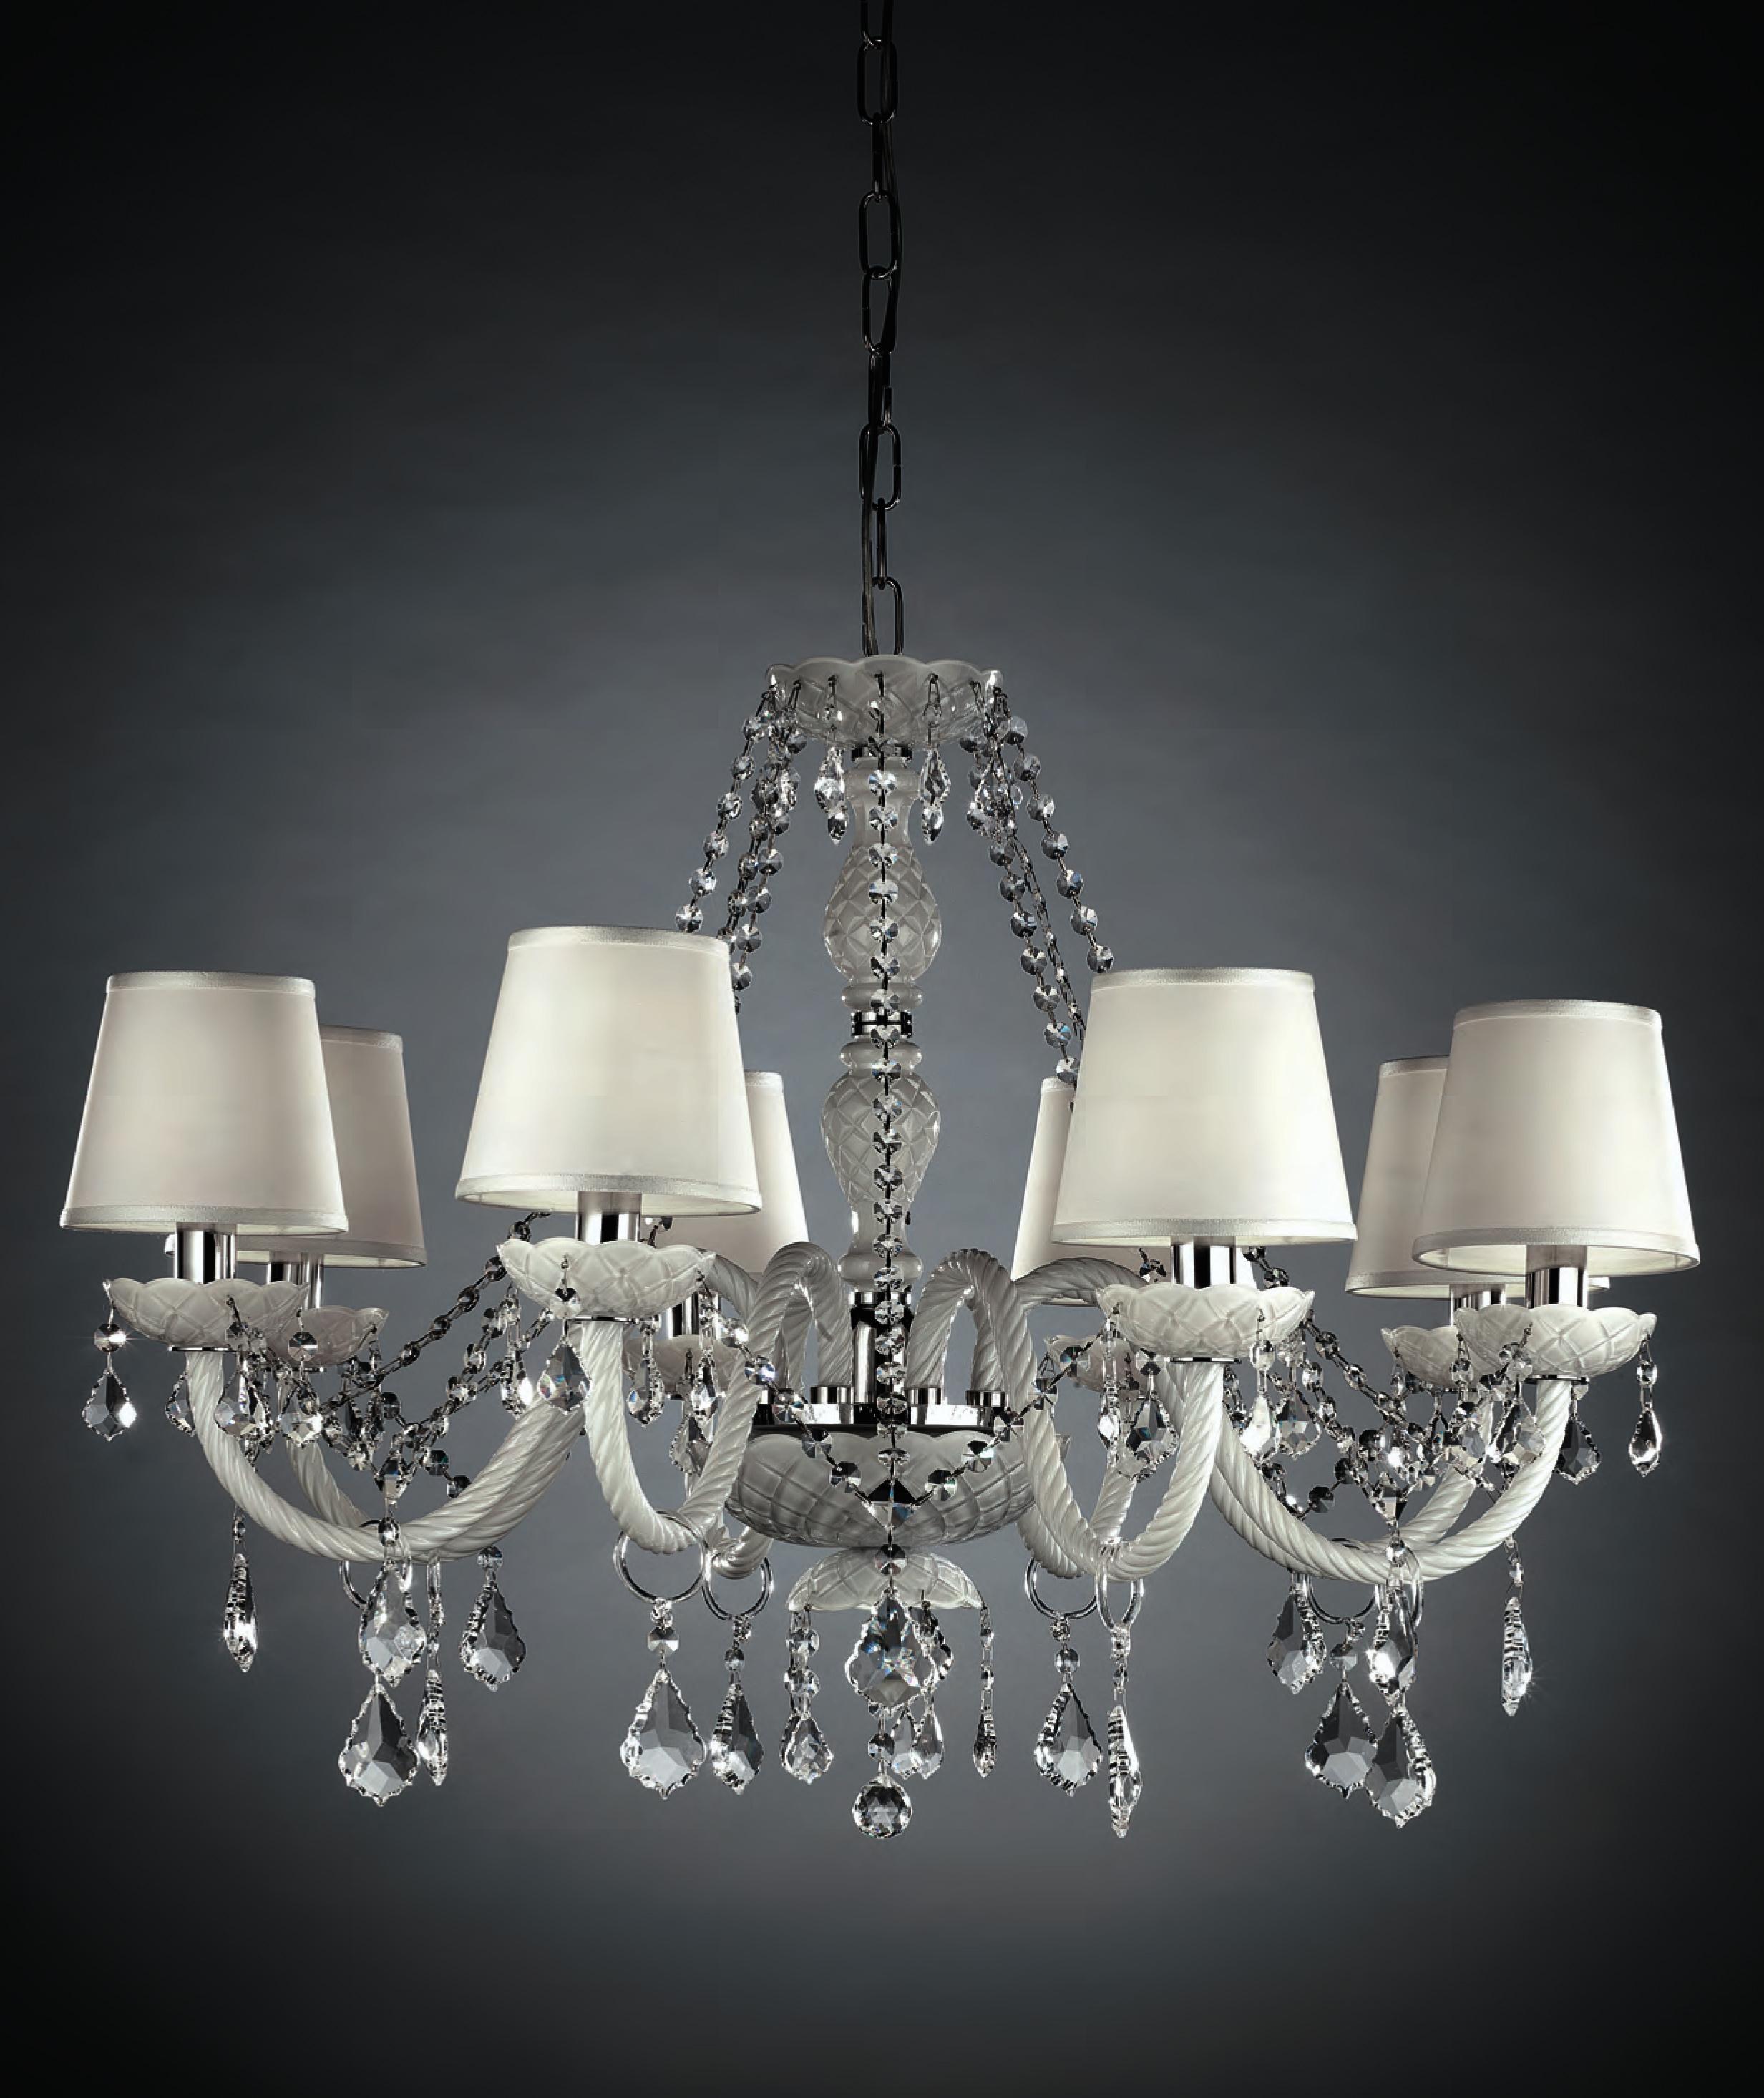 Vendita lampadari online economici awesome lampadari - Lampadari design economici ...